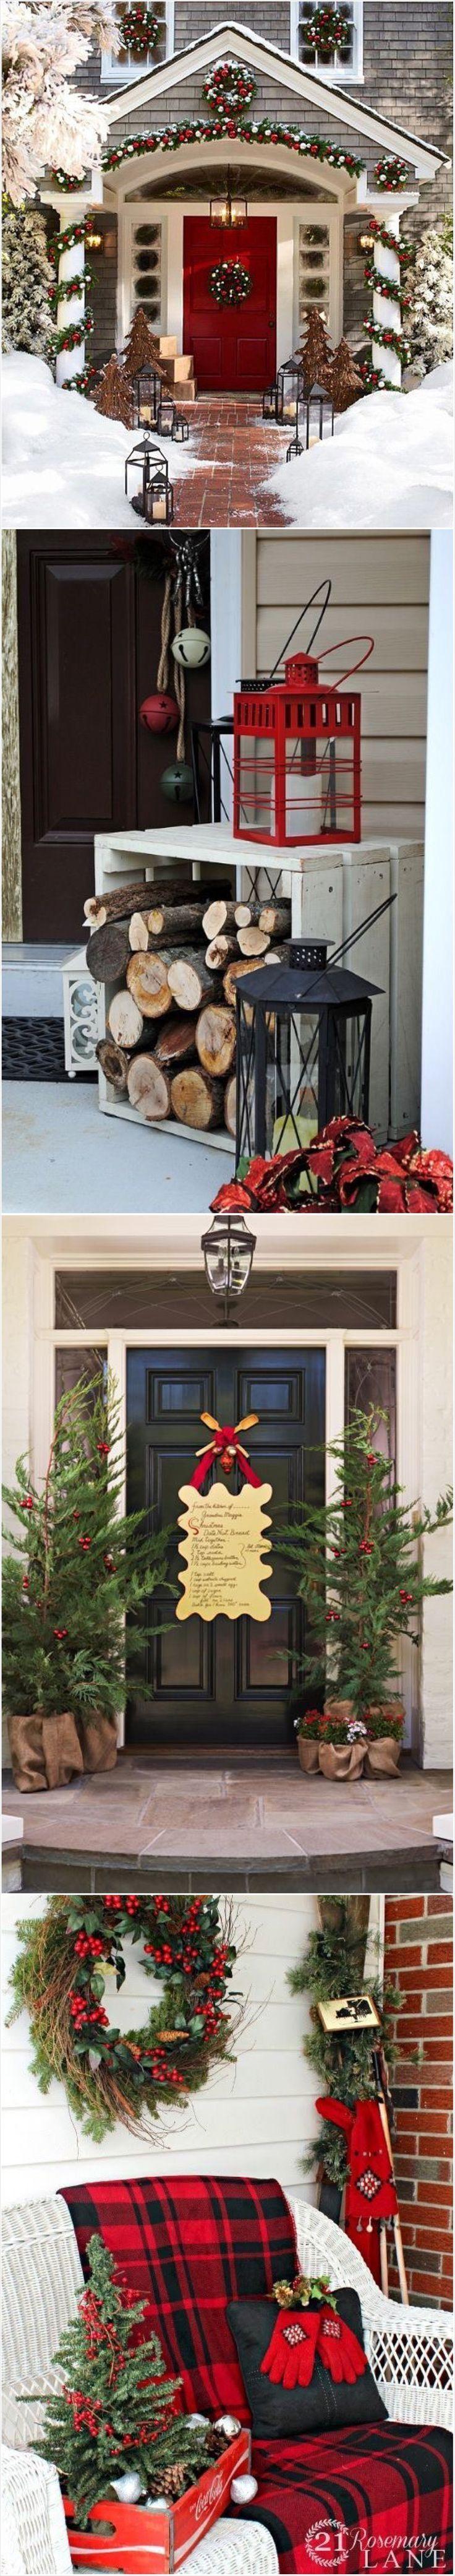 70 best Christmas decor images on Pinterest